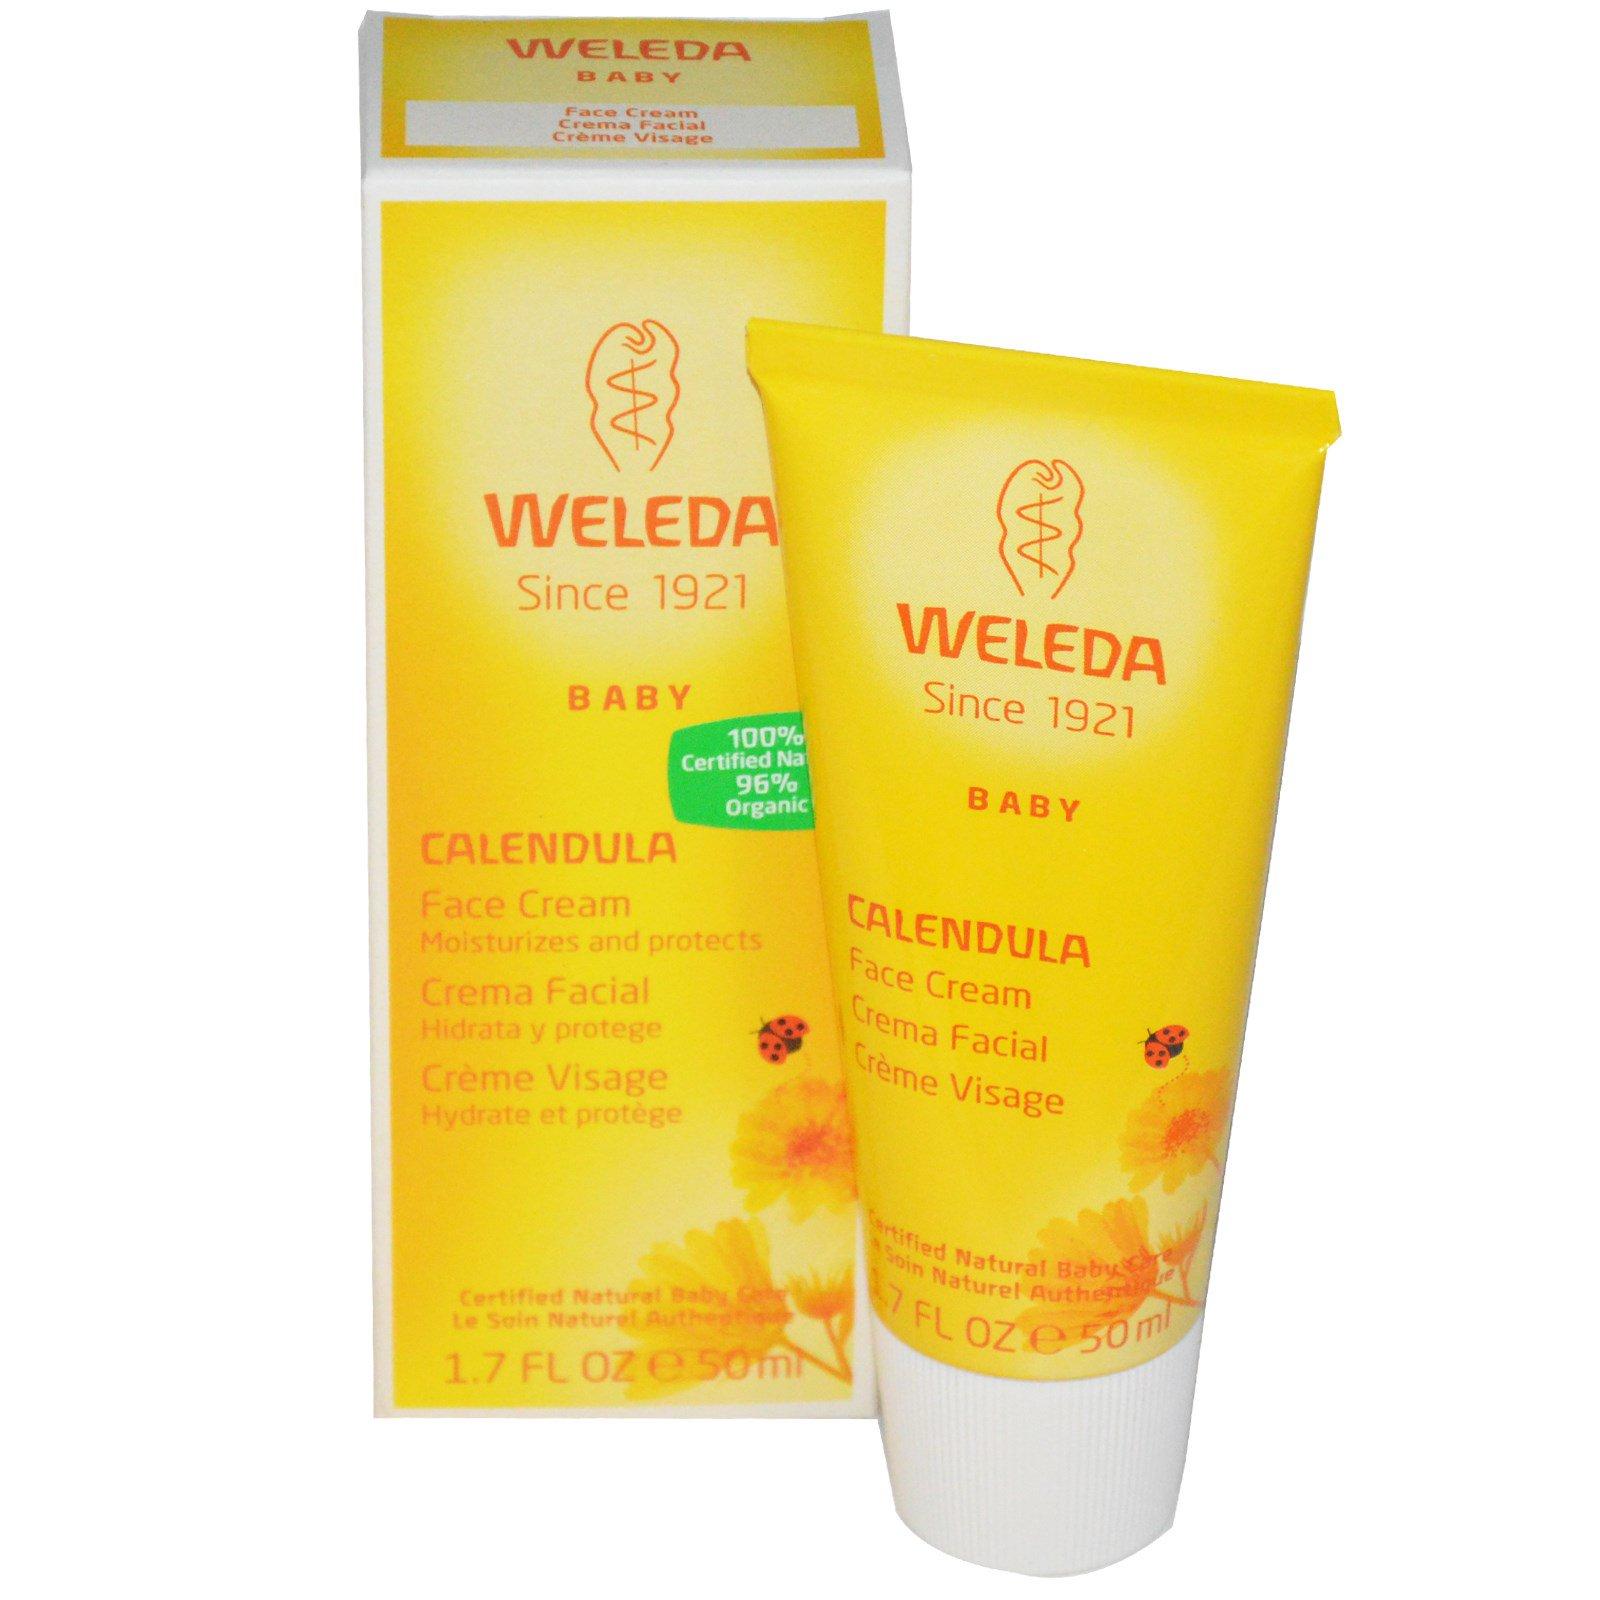 weleda baby face cream